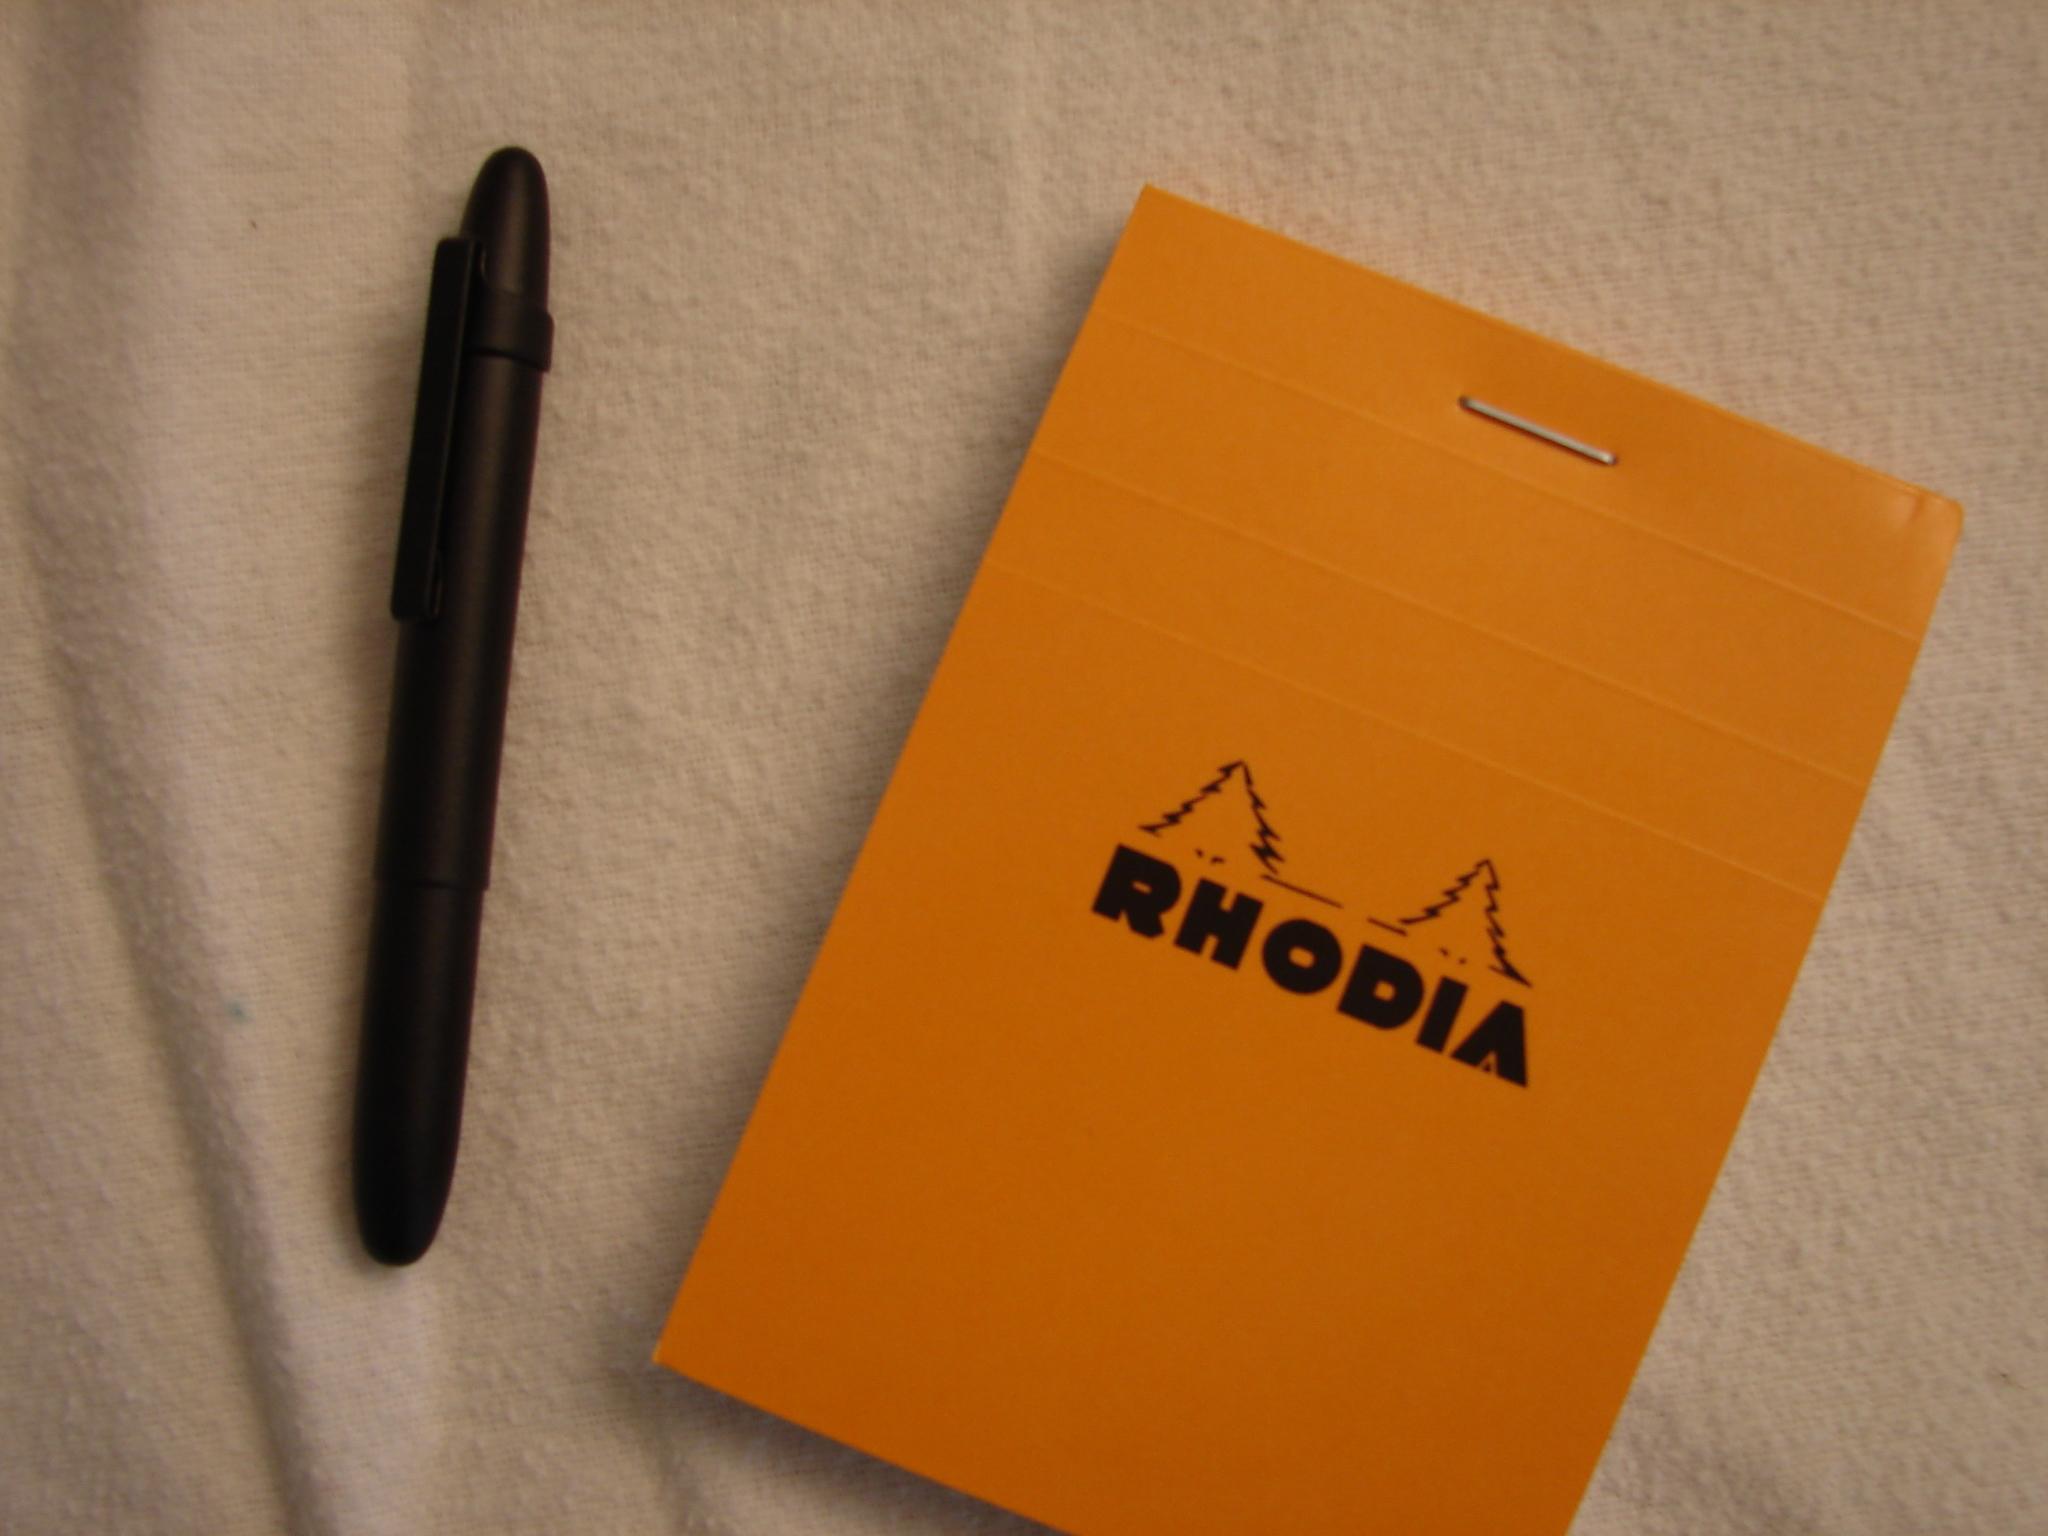 Rhodia Case